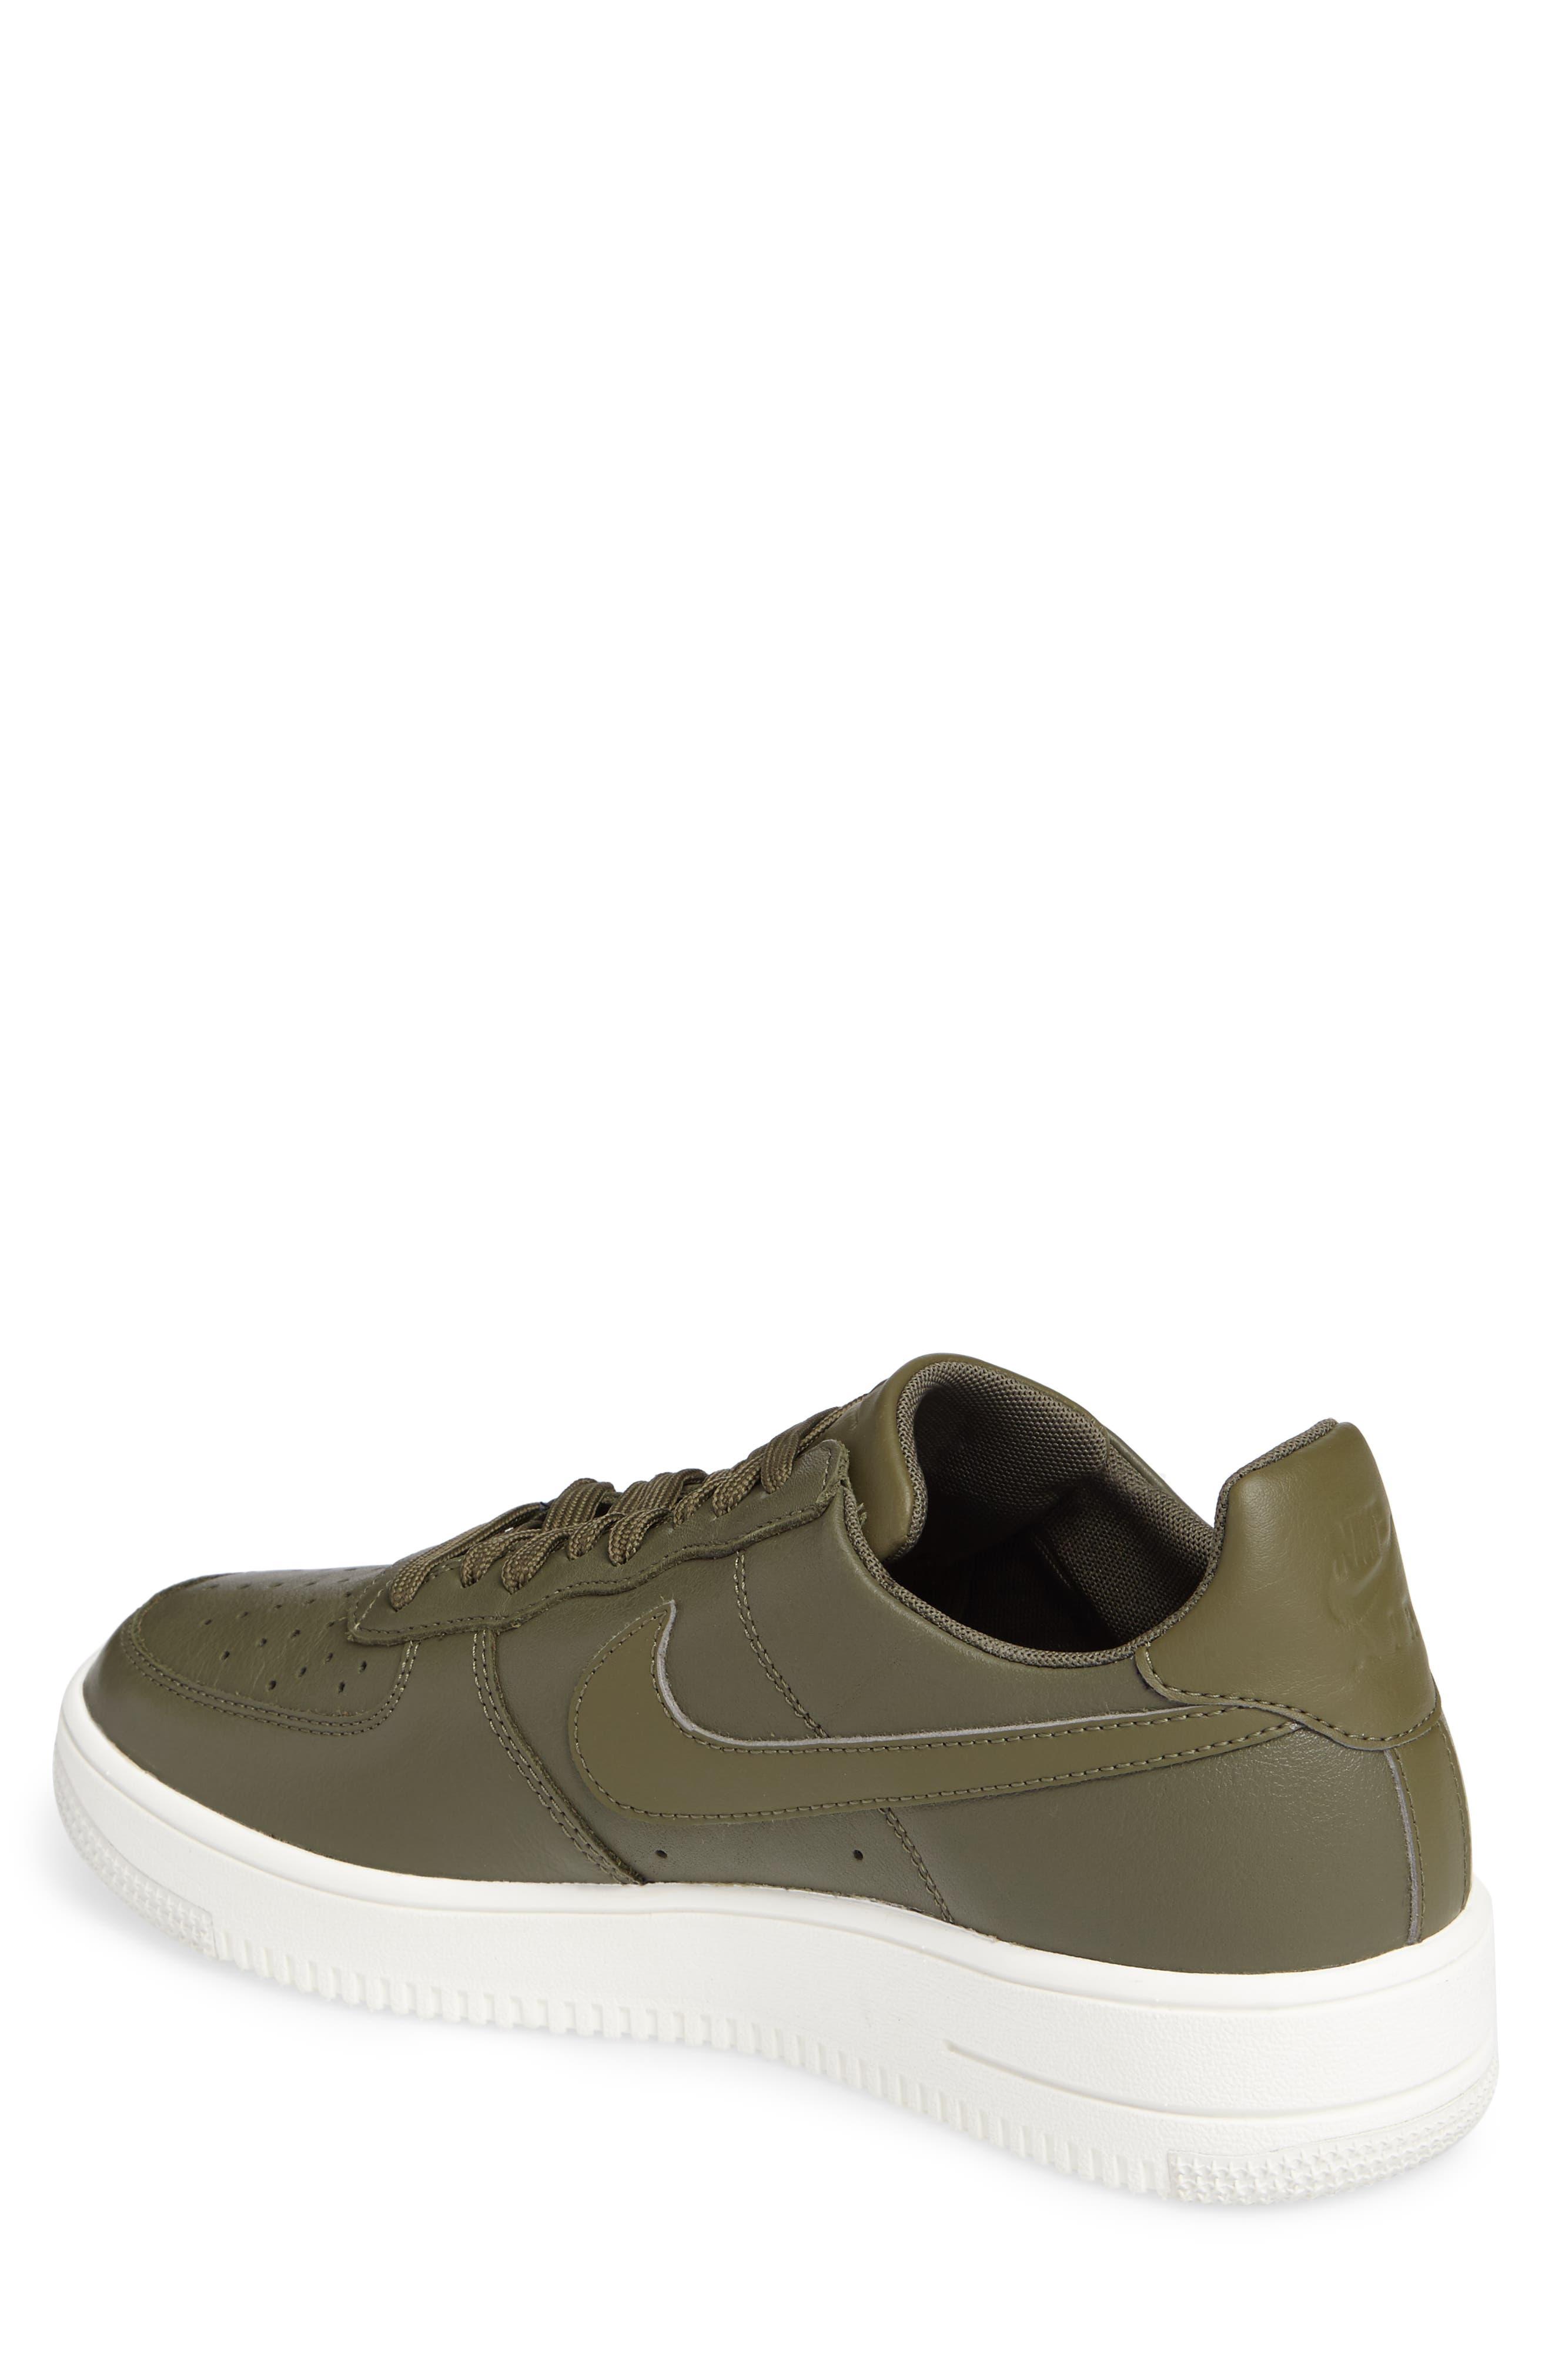 Air Force 1 Ultraforce Sneaker,                             Alternate thumbnail 8, color,